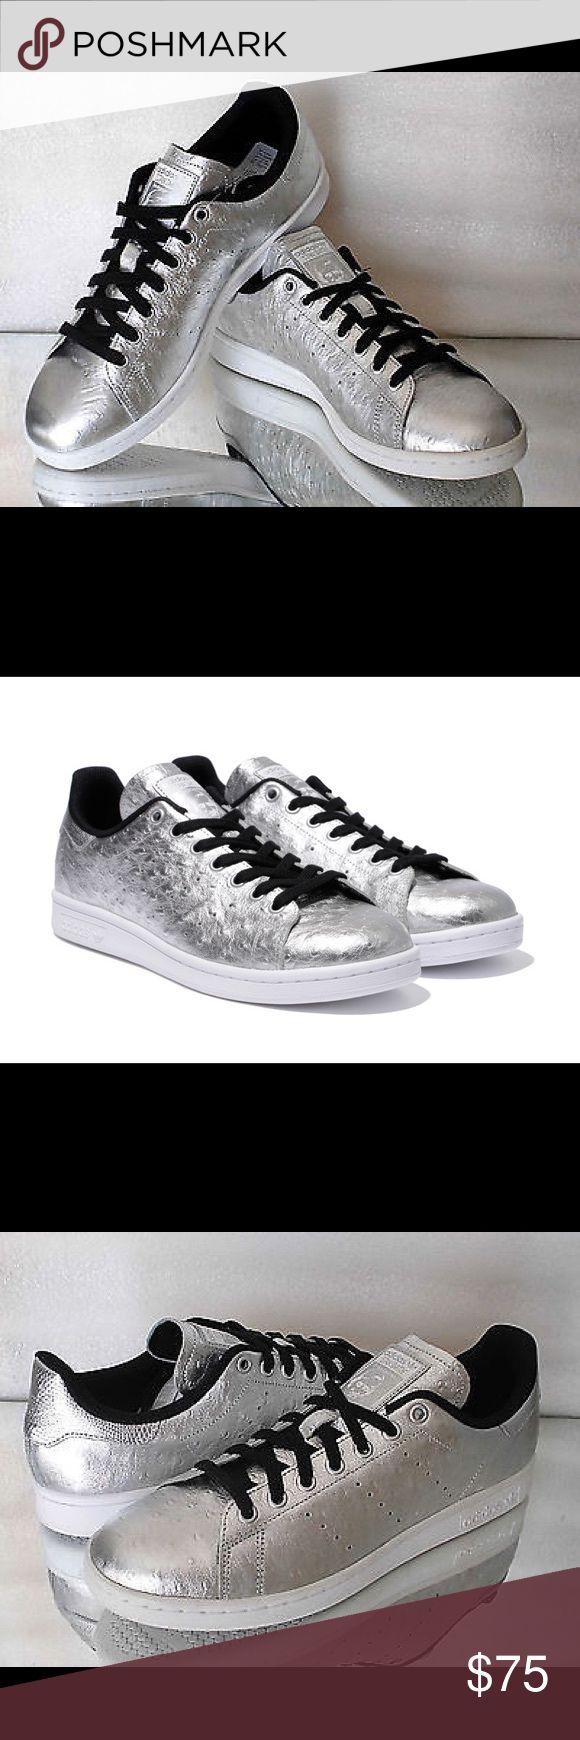 adidas yeezy zebra box tag adidas stan smith white black logo